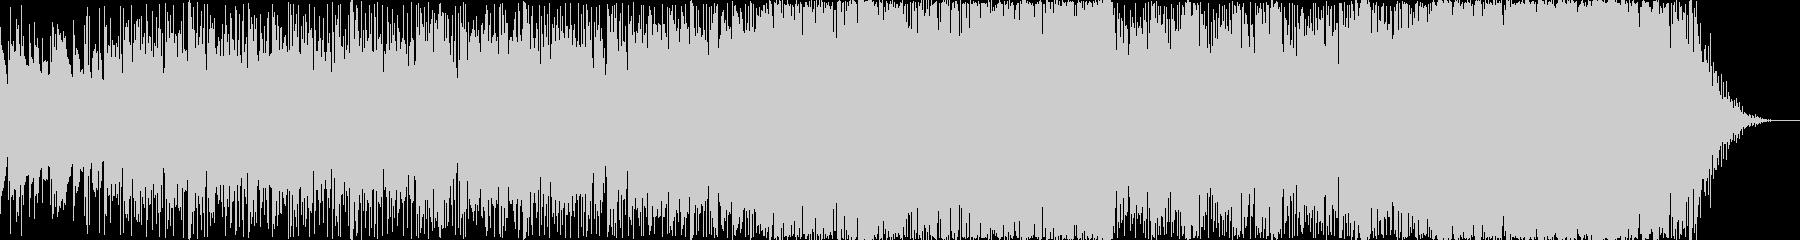 8bit音源 空を駆ける飛行艇のイメージの未再生の波形